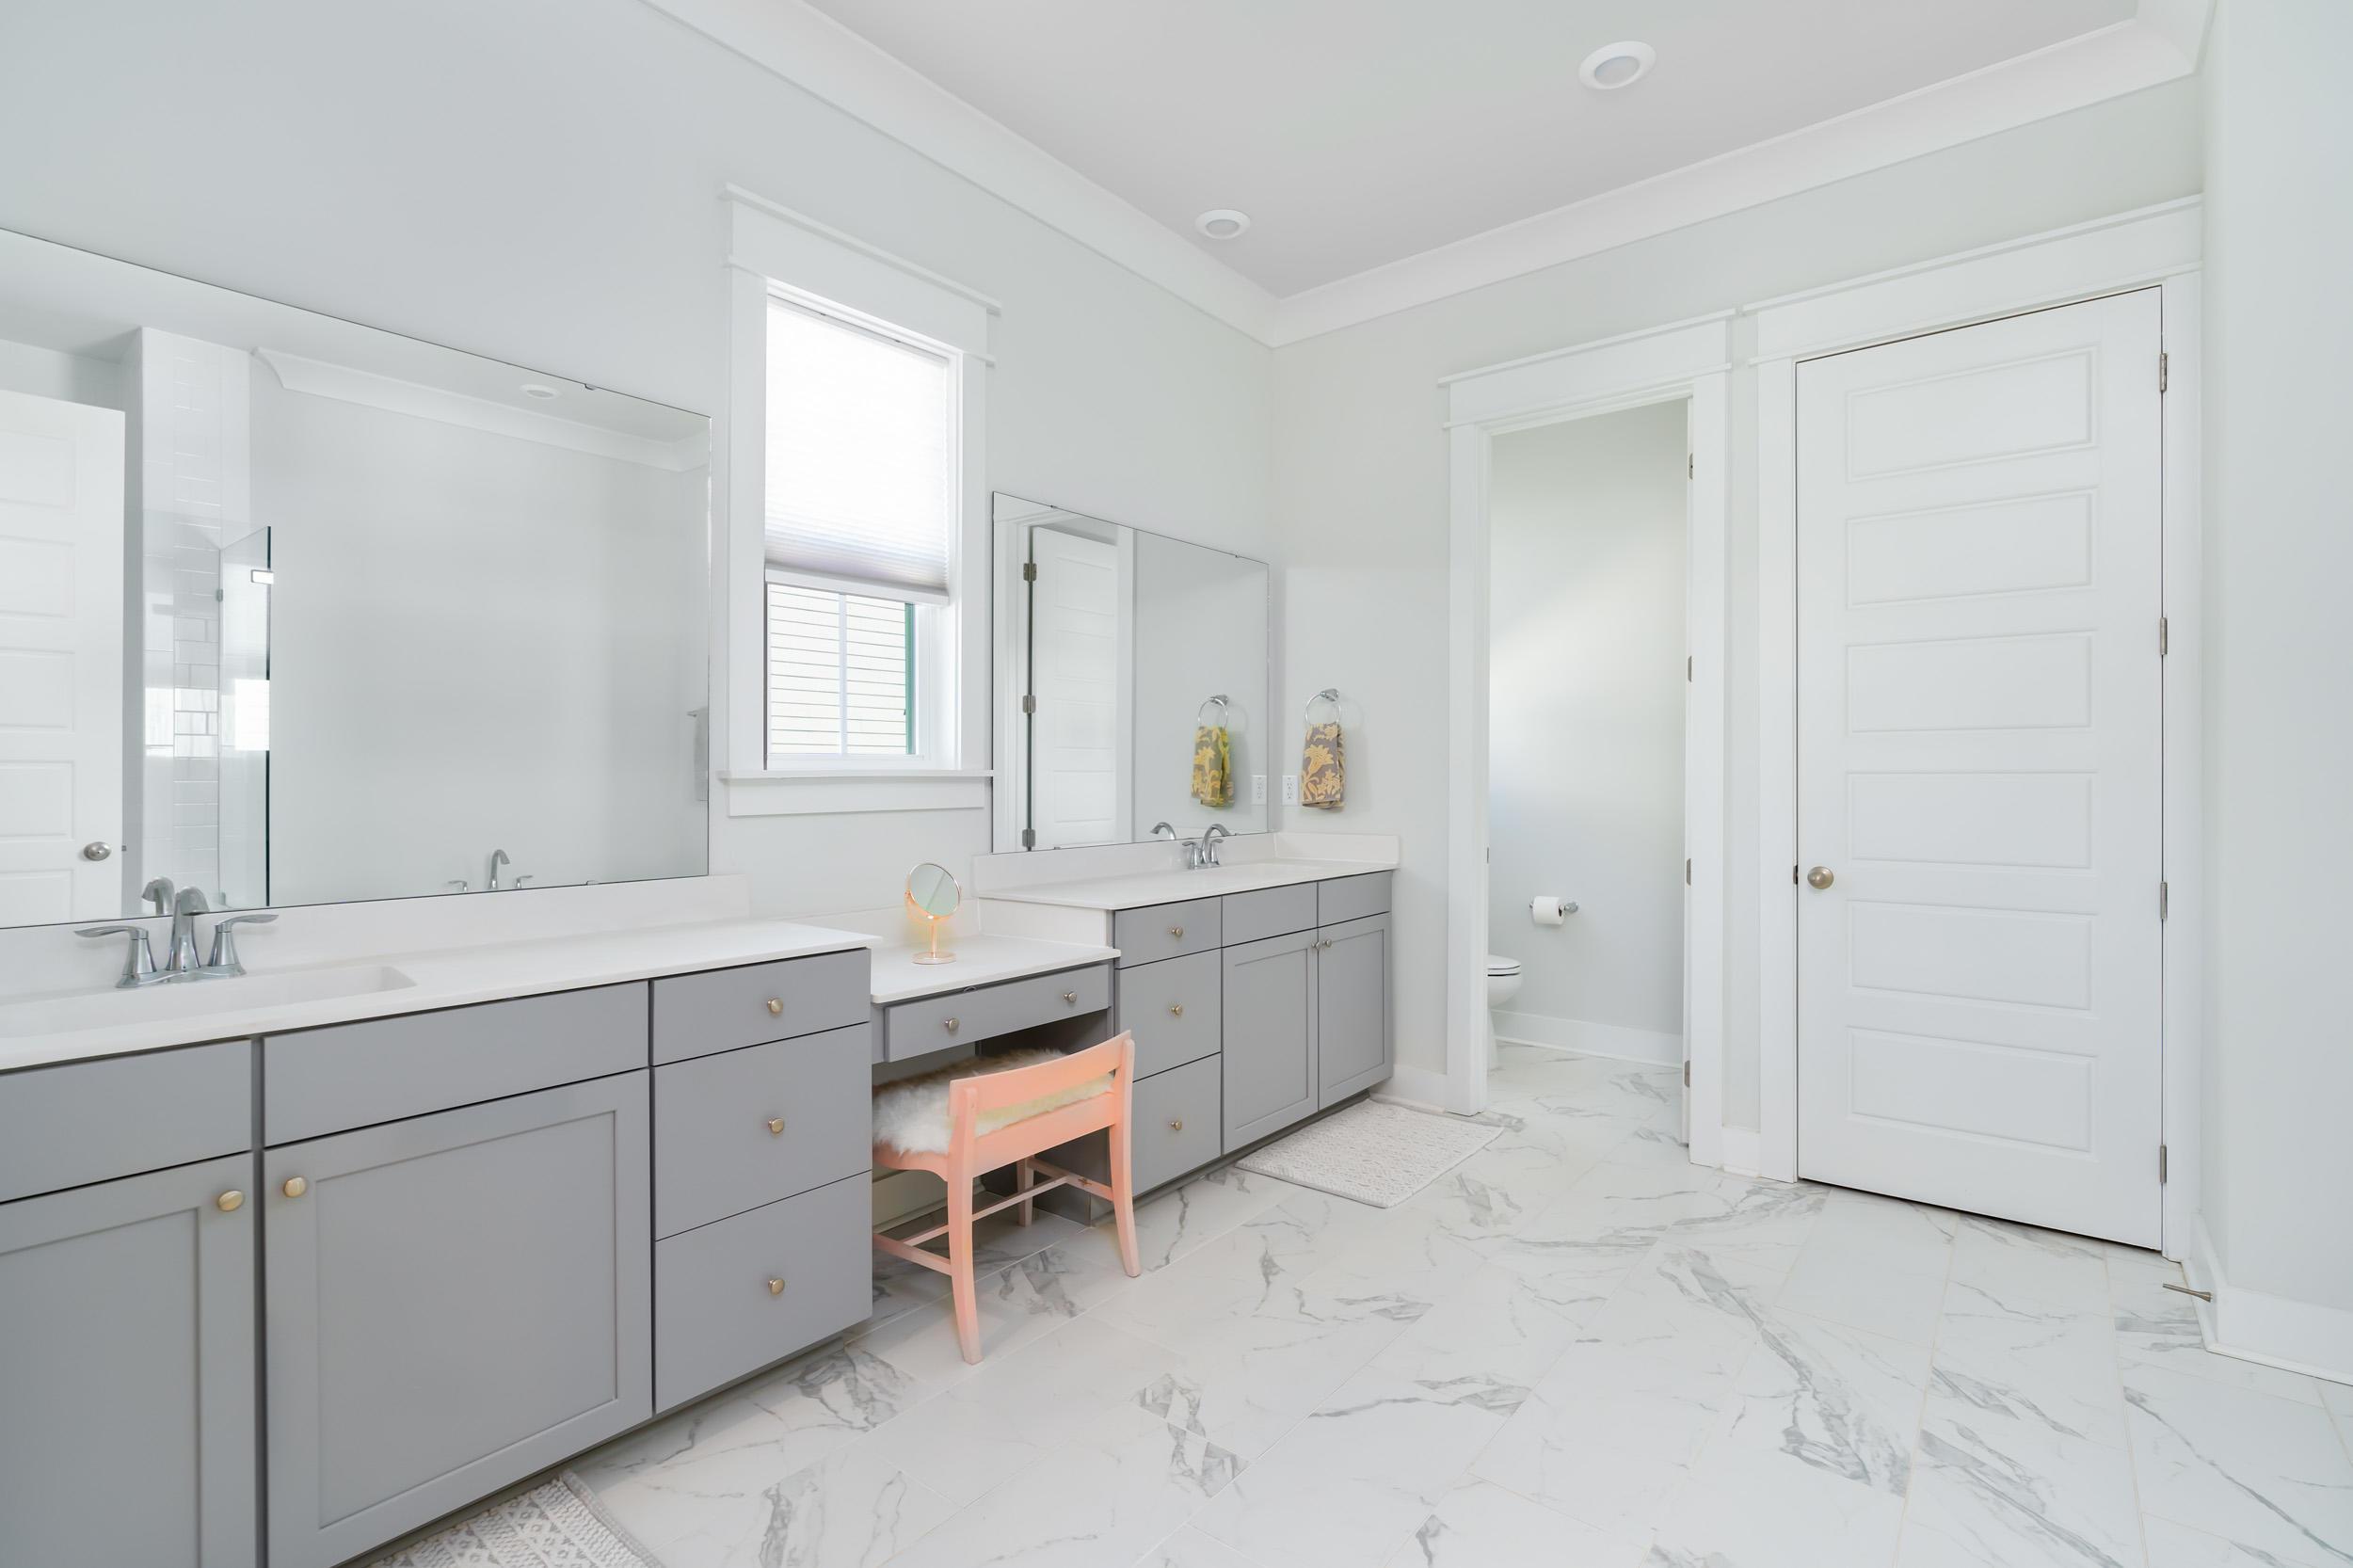 Hamlin Oaks Homes For Sale - 2921 Tranquility, Mount Pleasant, SC - 10